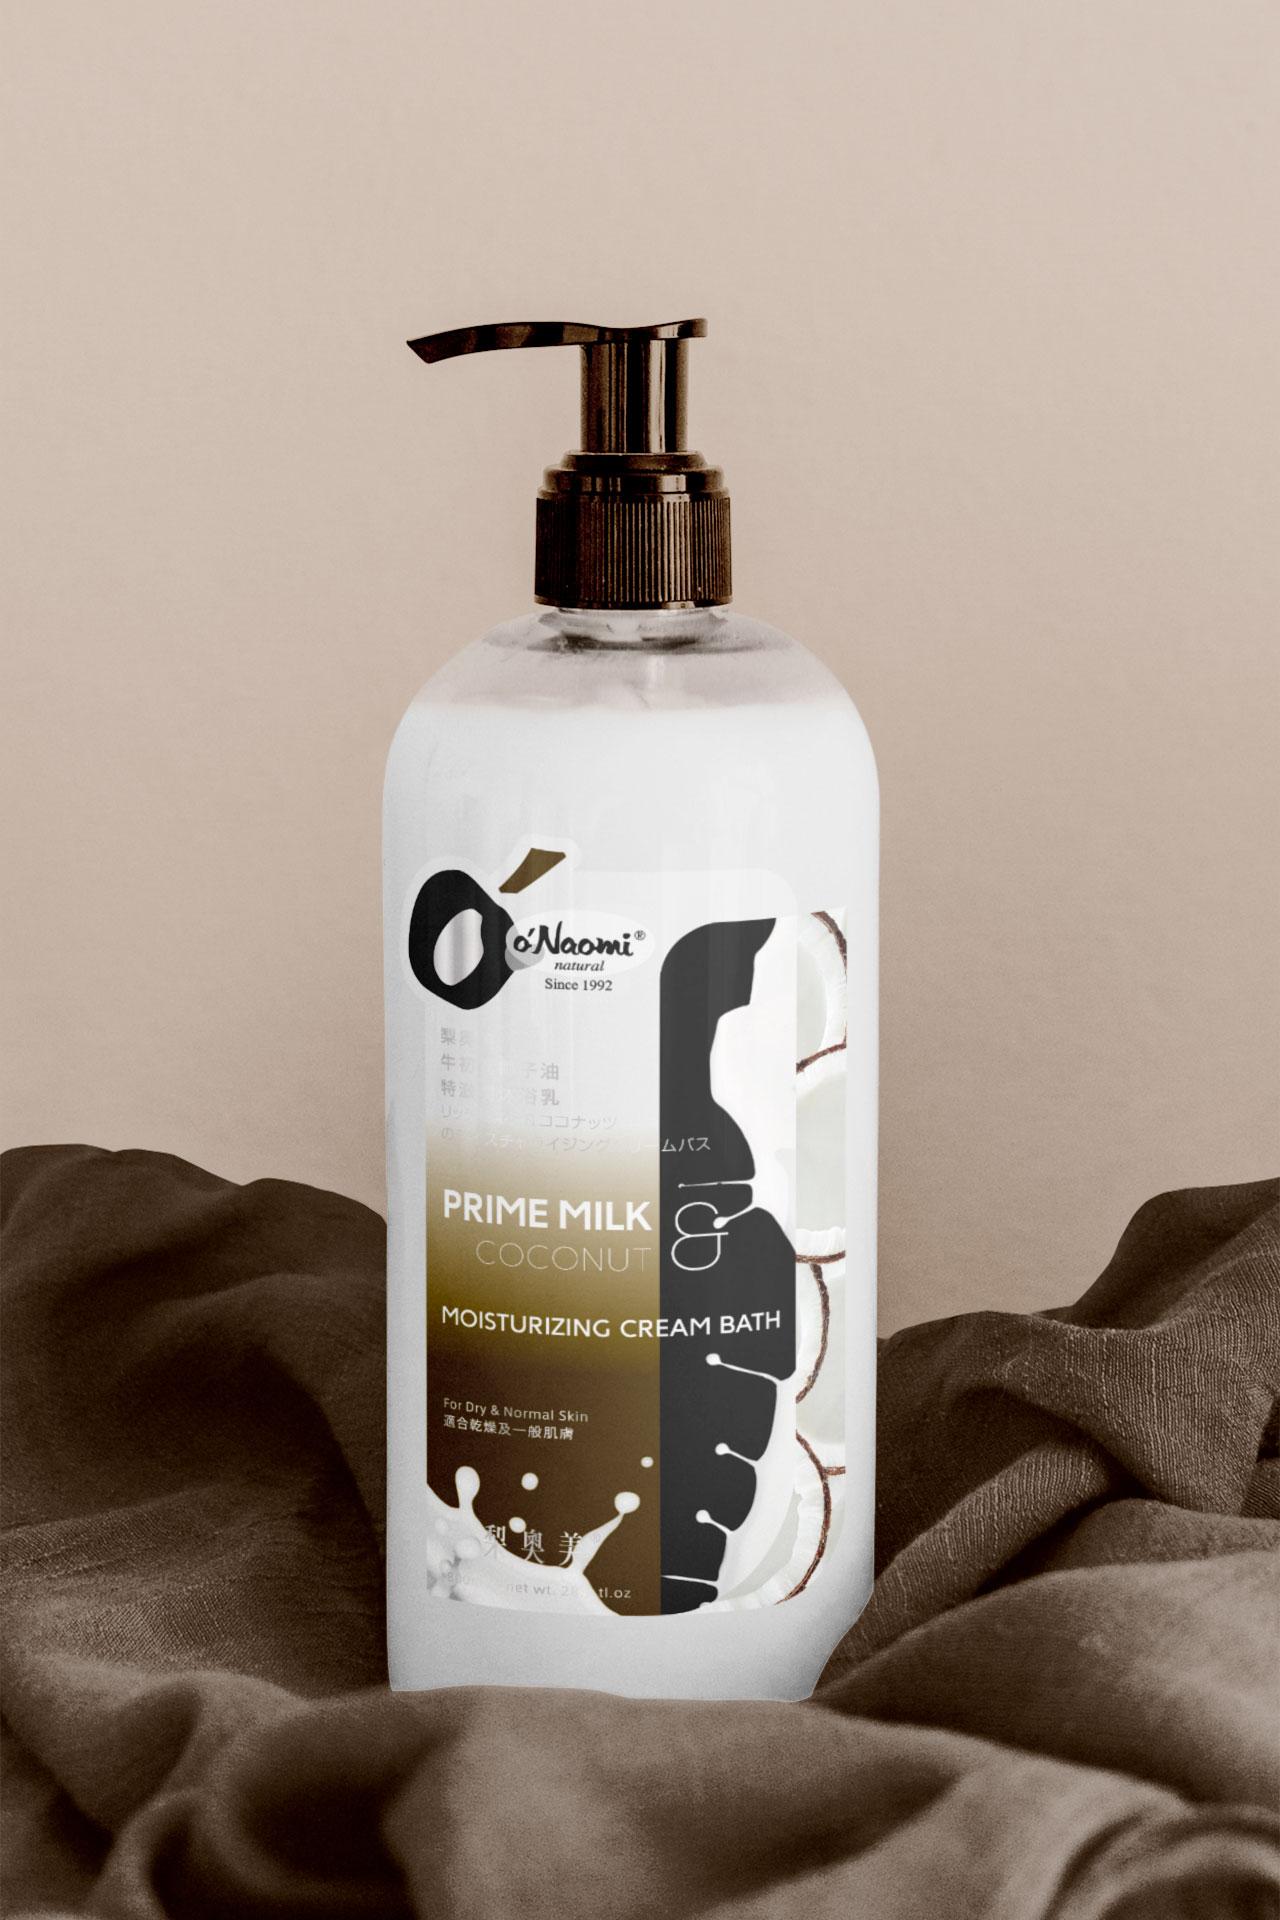 Onaomi Natural Series D Version Bath Styles C Mockup B